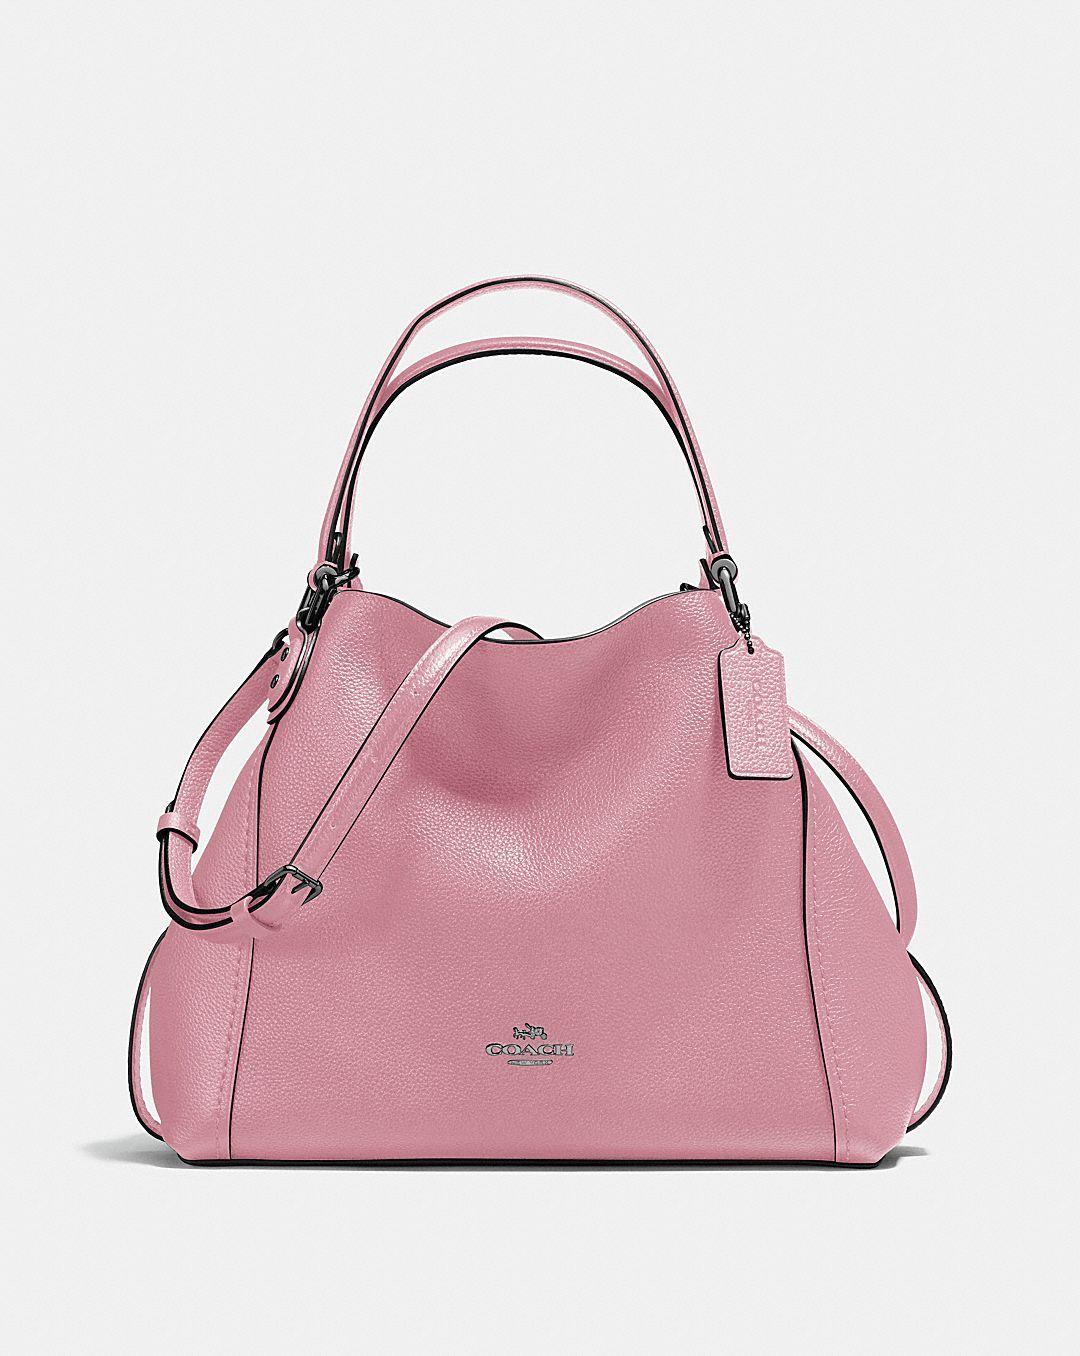 Handbags for Women - Designer Bags & Purses | COACH® | Coach edie ...